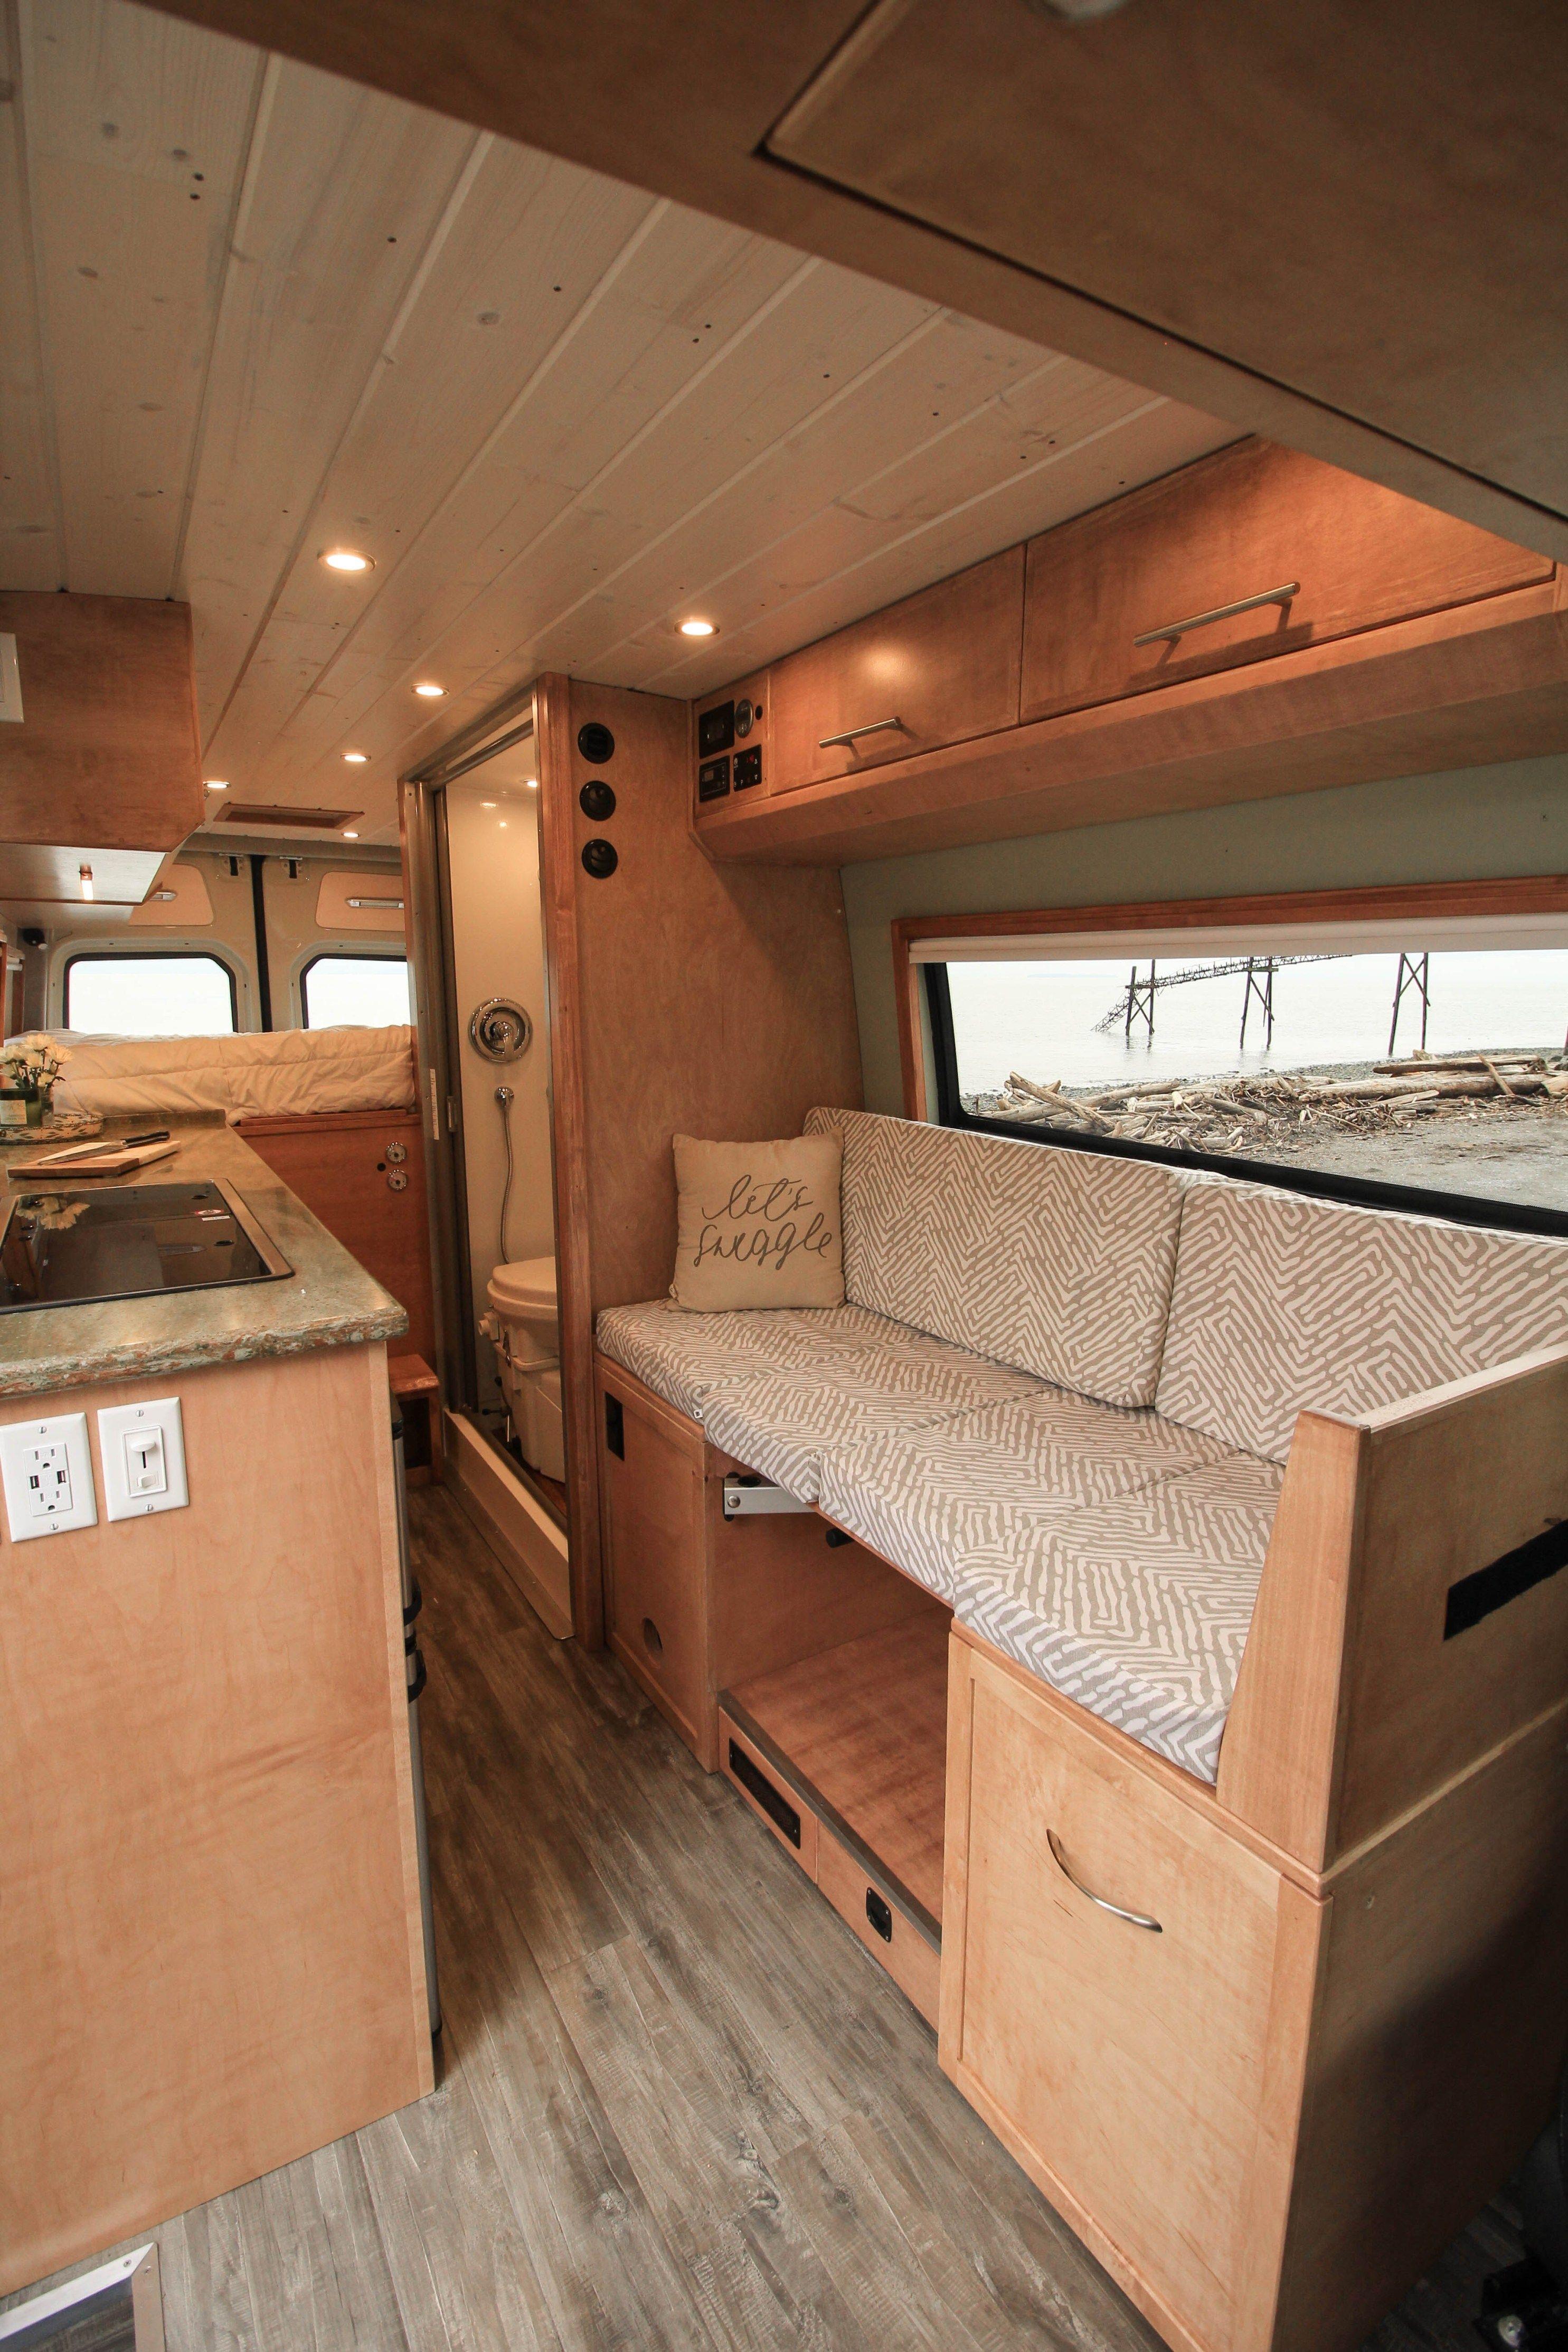 Fitz Roy Freedom Vans 170 Sprinter Van Conversion Amenagement Camionette Fourgon Amenage Camping Car Amenagement Camping Car